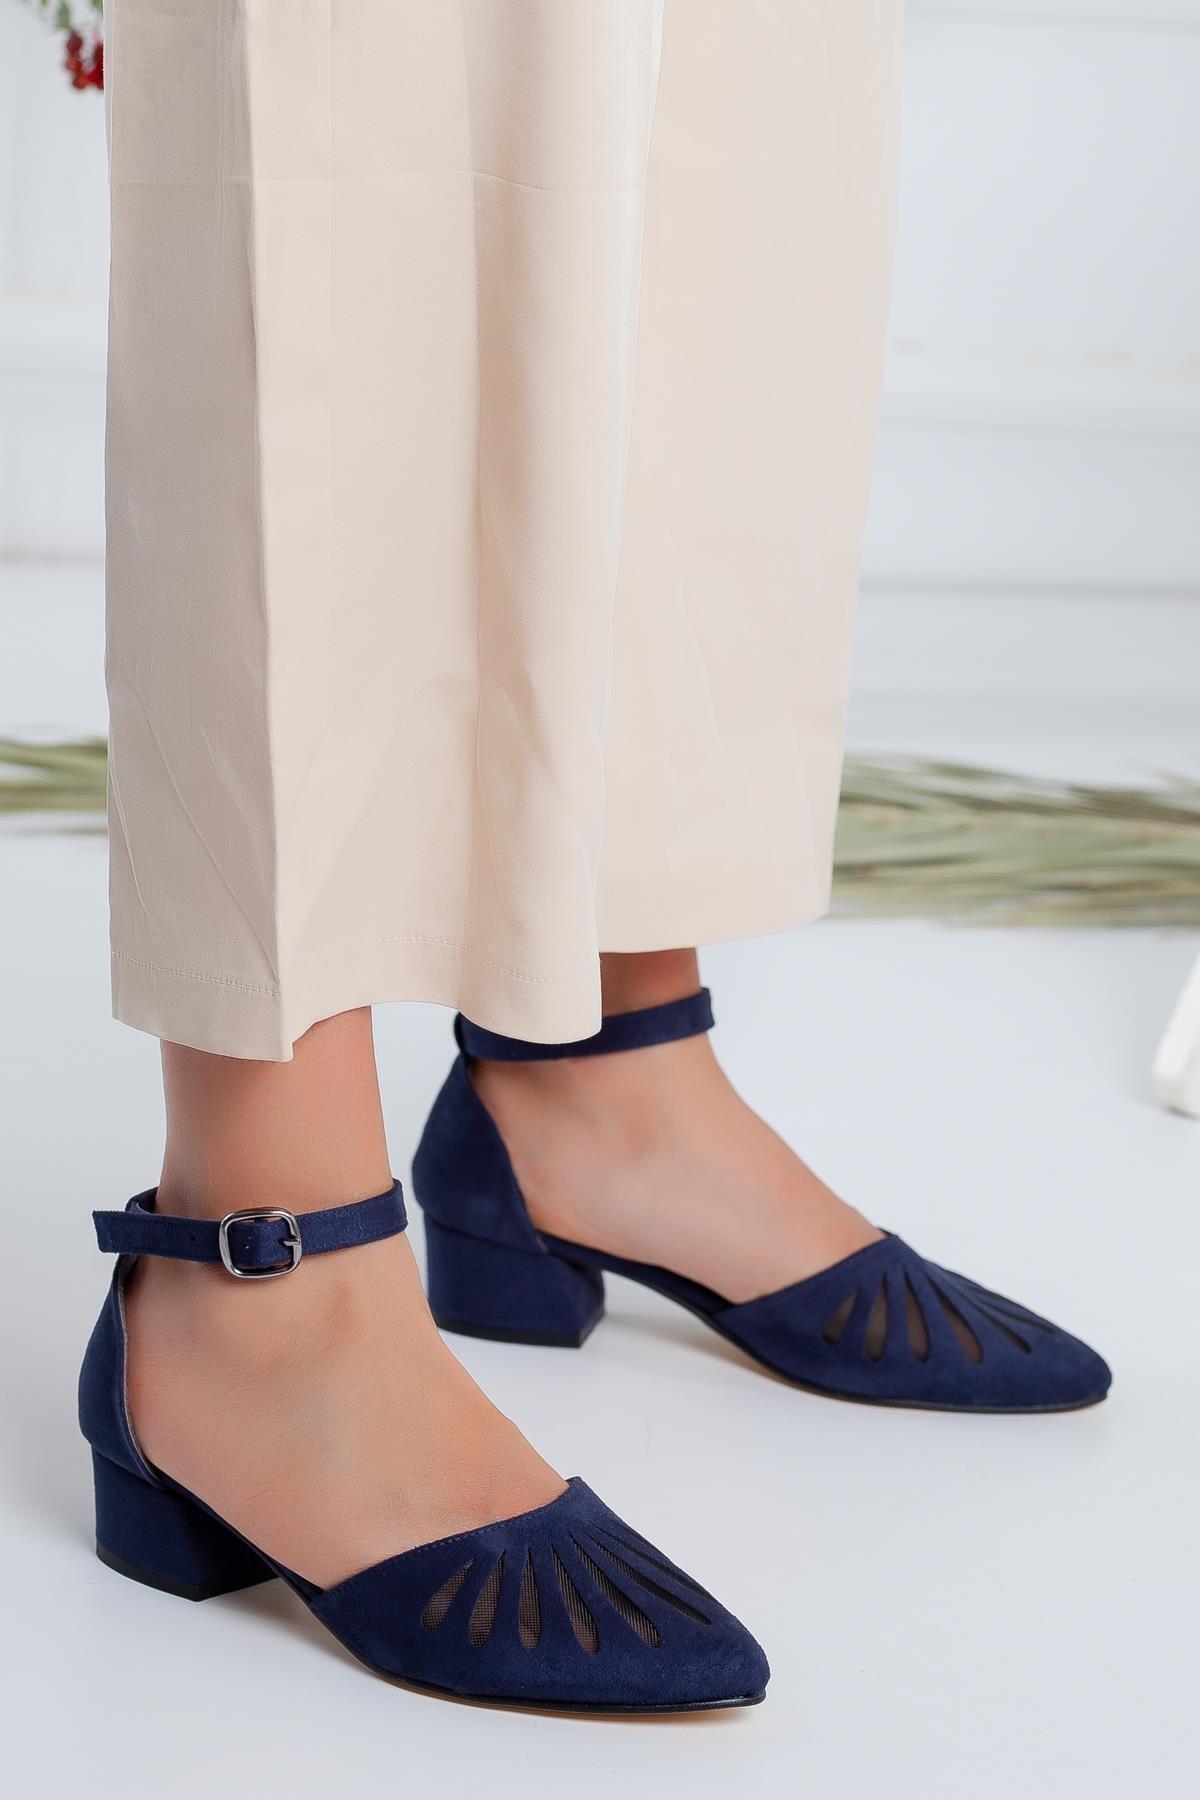 Moda Eleysa Chica Süet Topuklu Ayakkabı 2